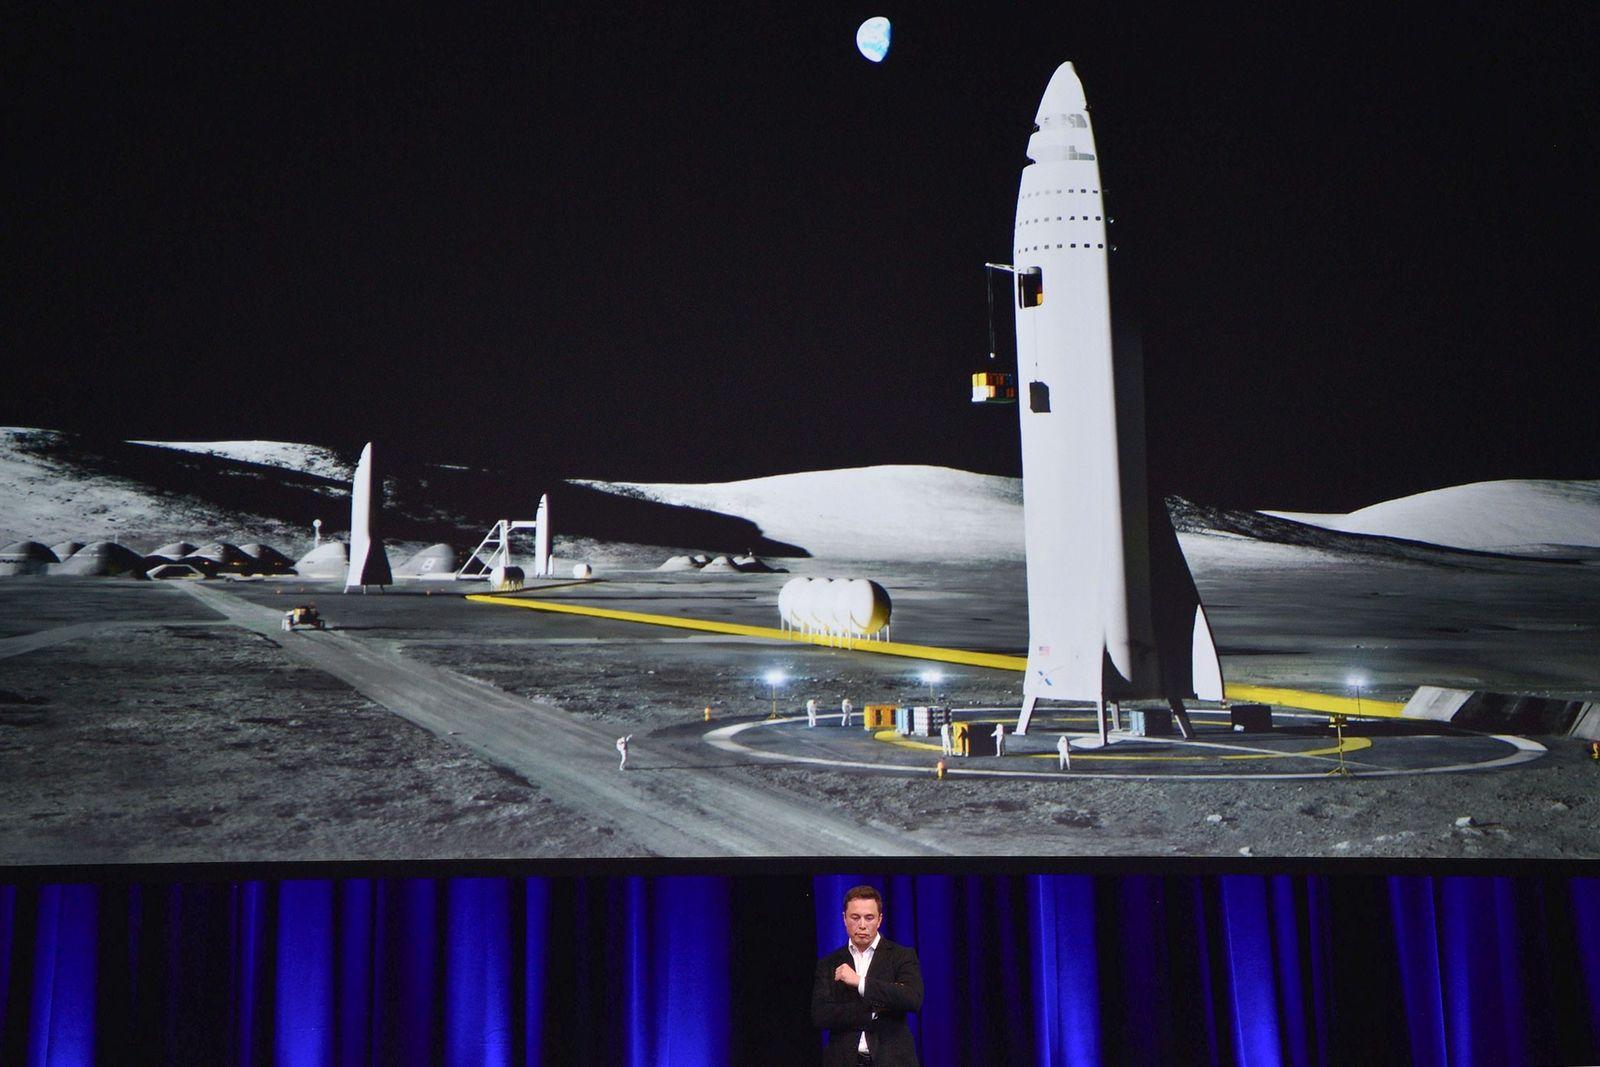 Elon Musk, fundador da SpaceX